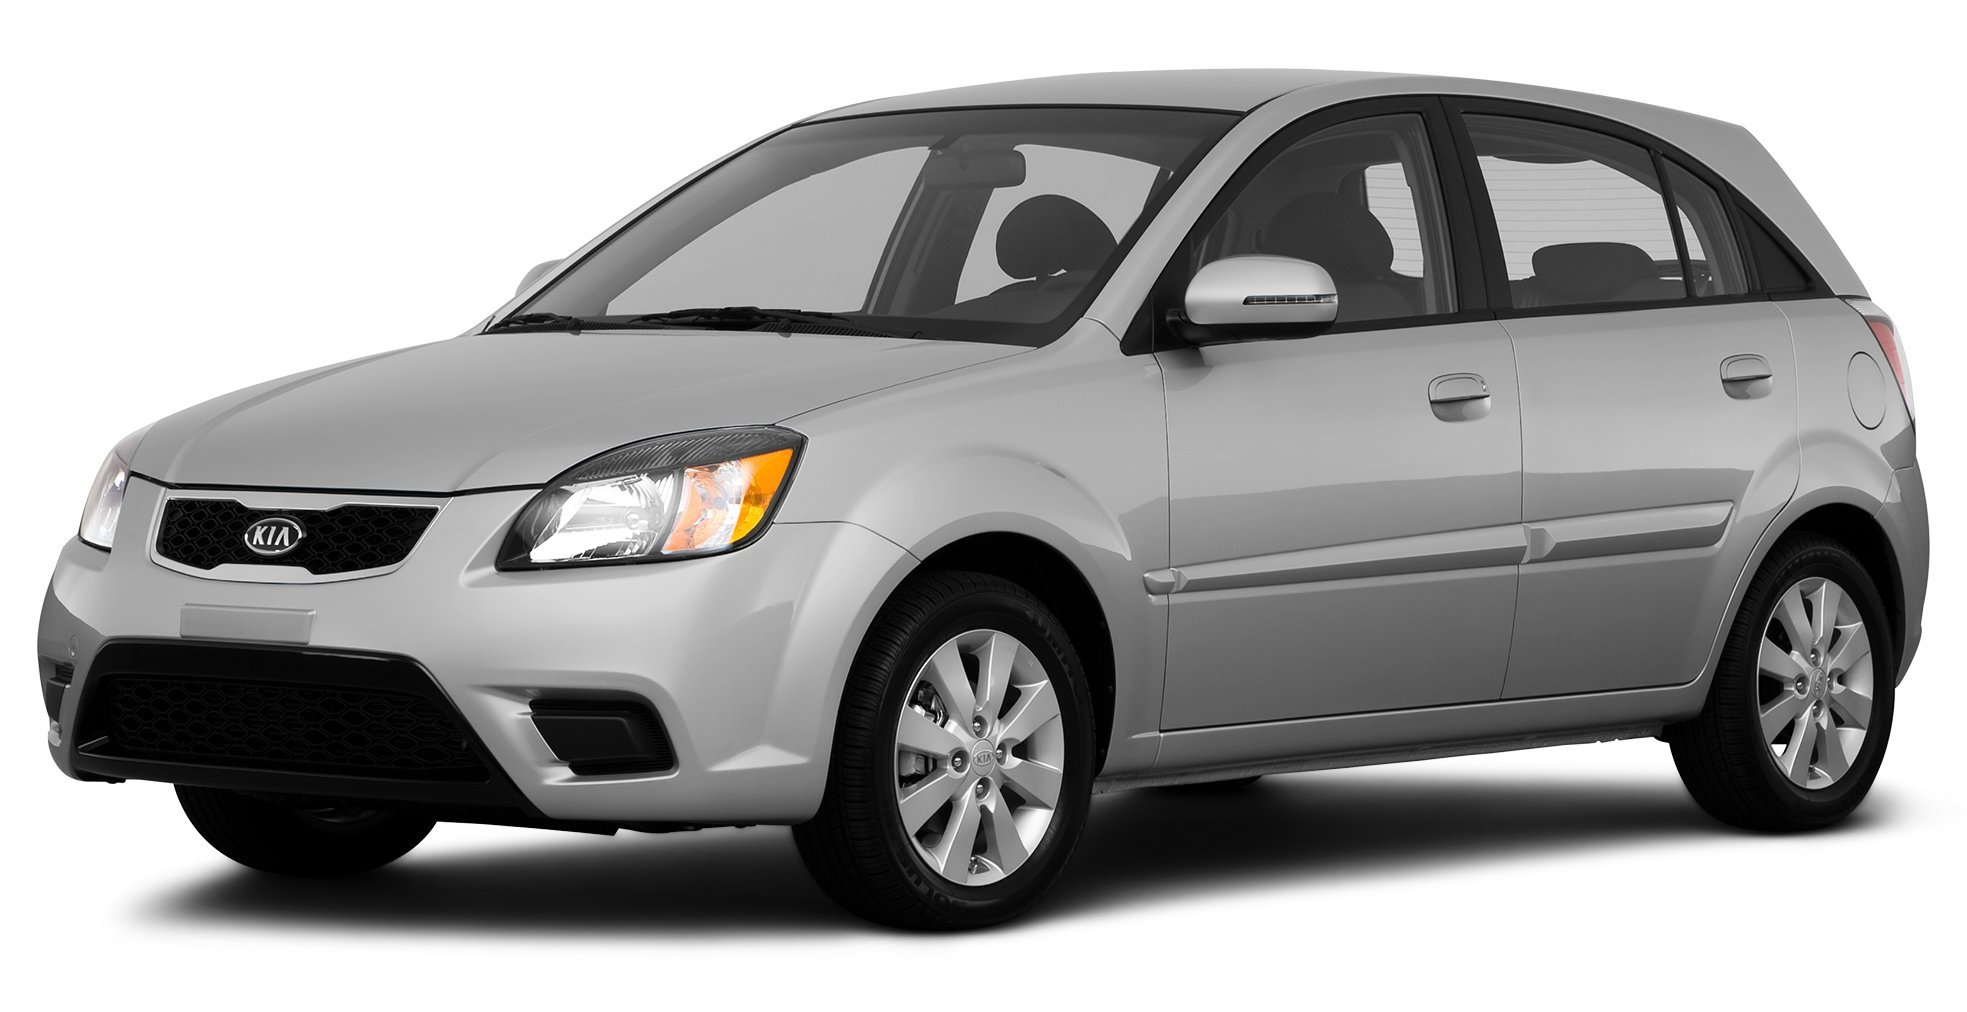 2010 hyundai elantra gls -  2010 Kia Rio5 Lx 5 Door Hatchback Manual Transmission Rio5 2010 Hyundai Elantra